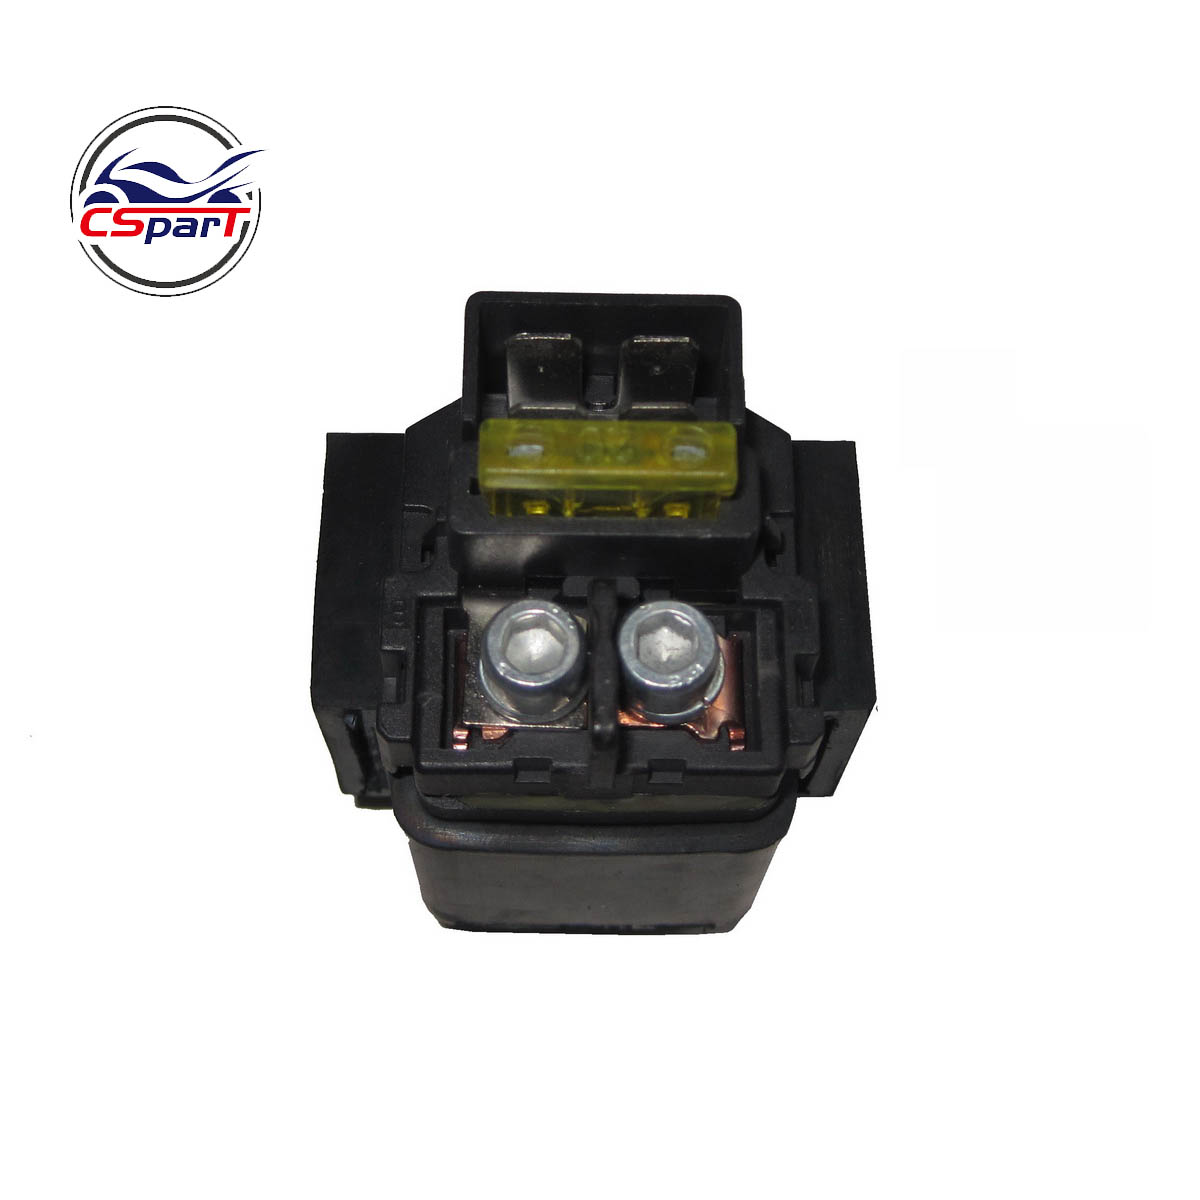 Starter Solenoid Relay For Linhai 250cc 300cc 400cc LH250 YP250 300T-B BUYANG FA-D300 H300 ATV UTV